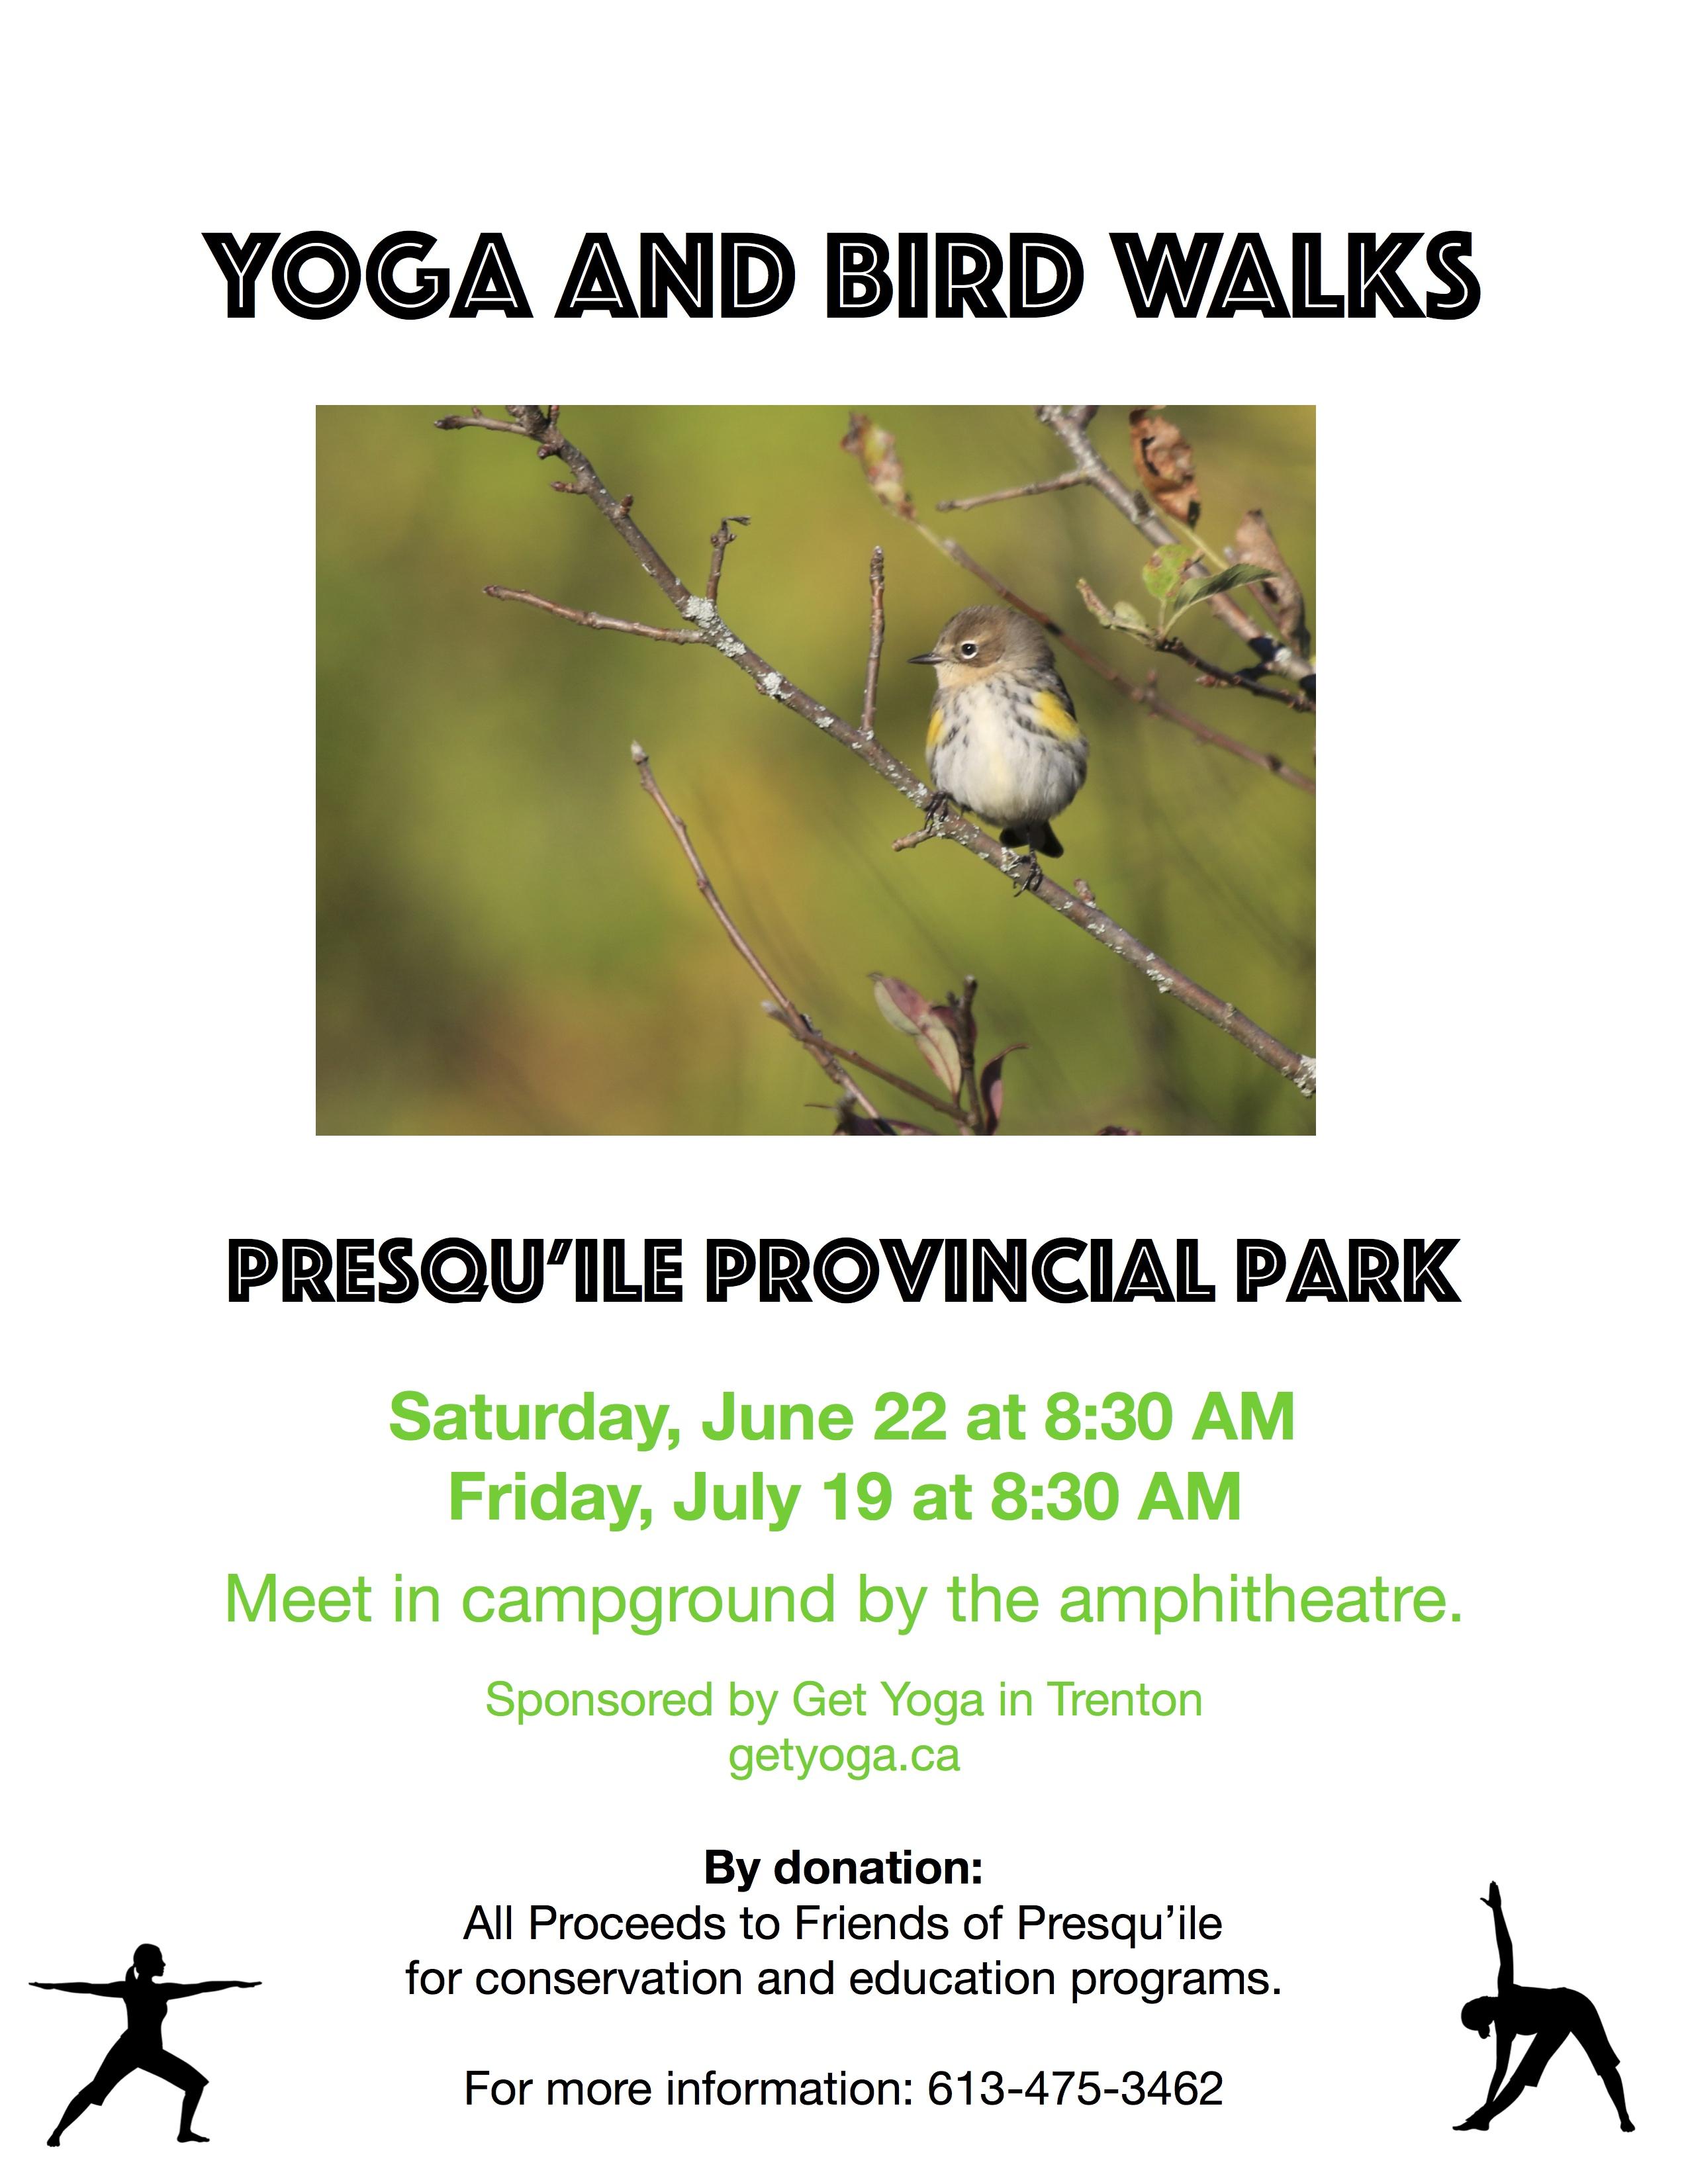 Yoga and Bird Walks poster